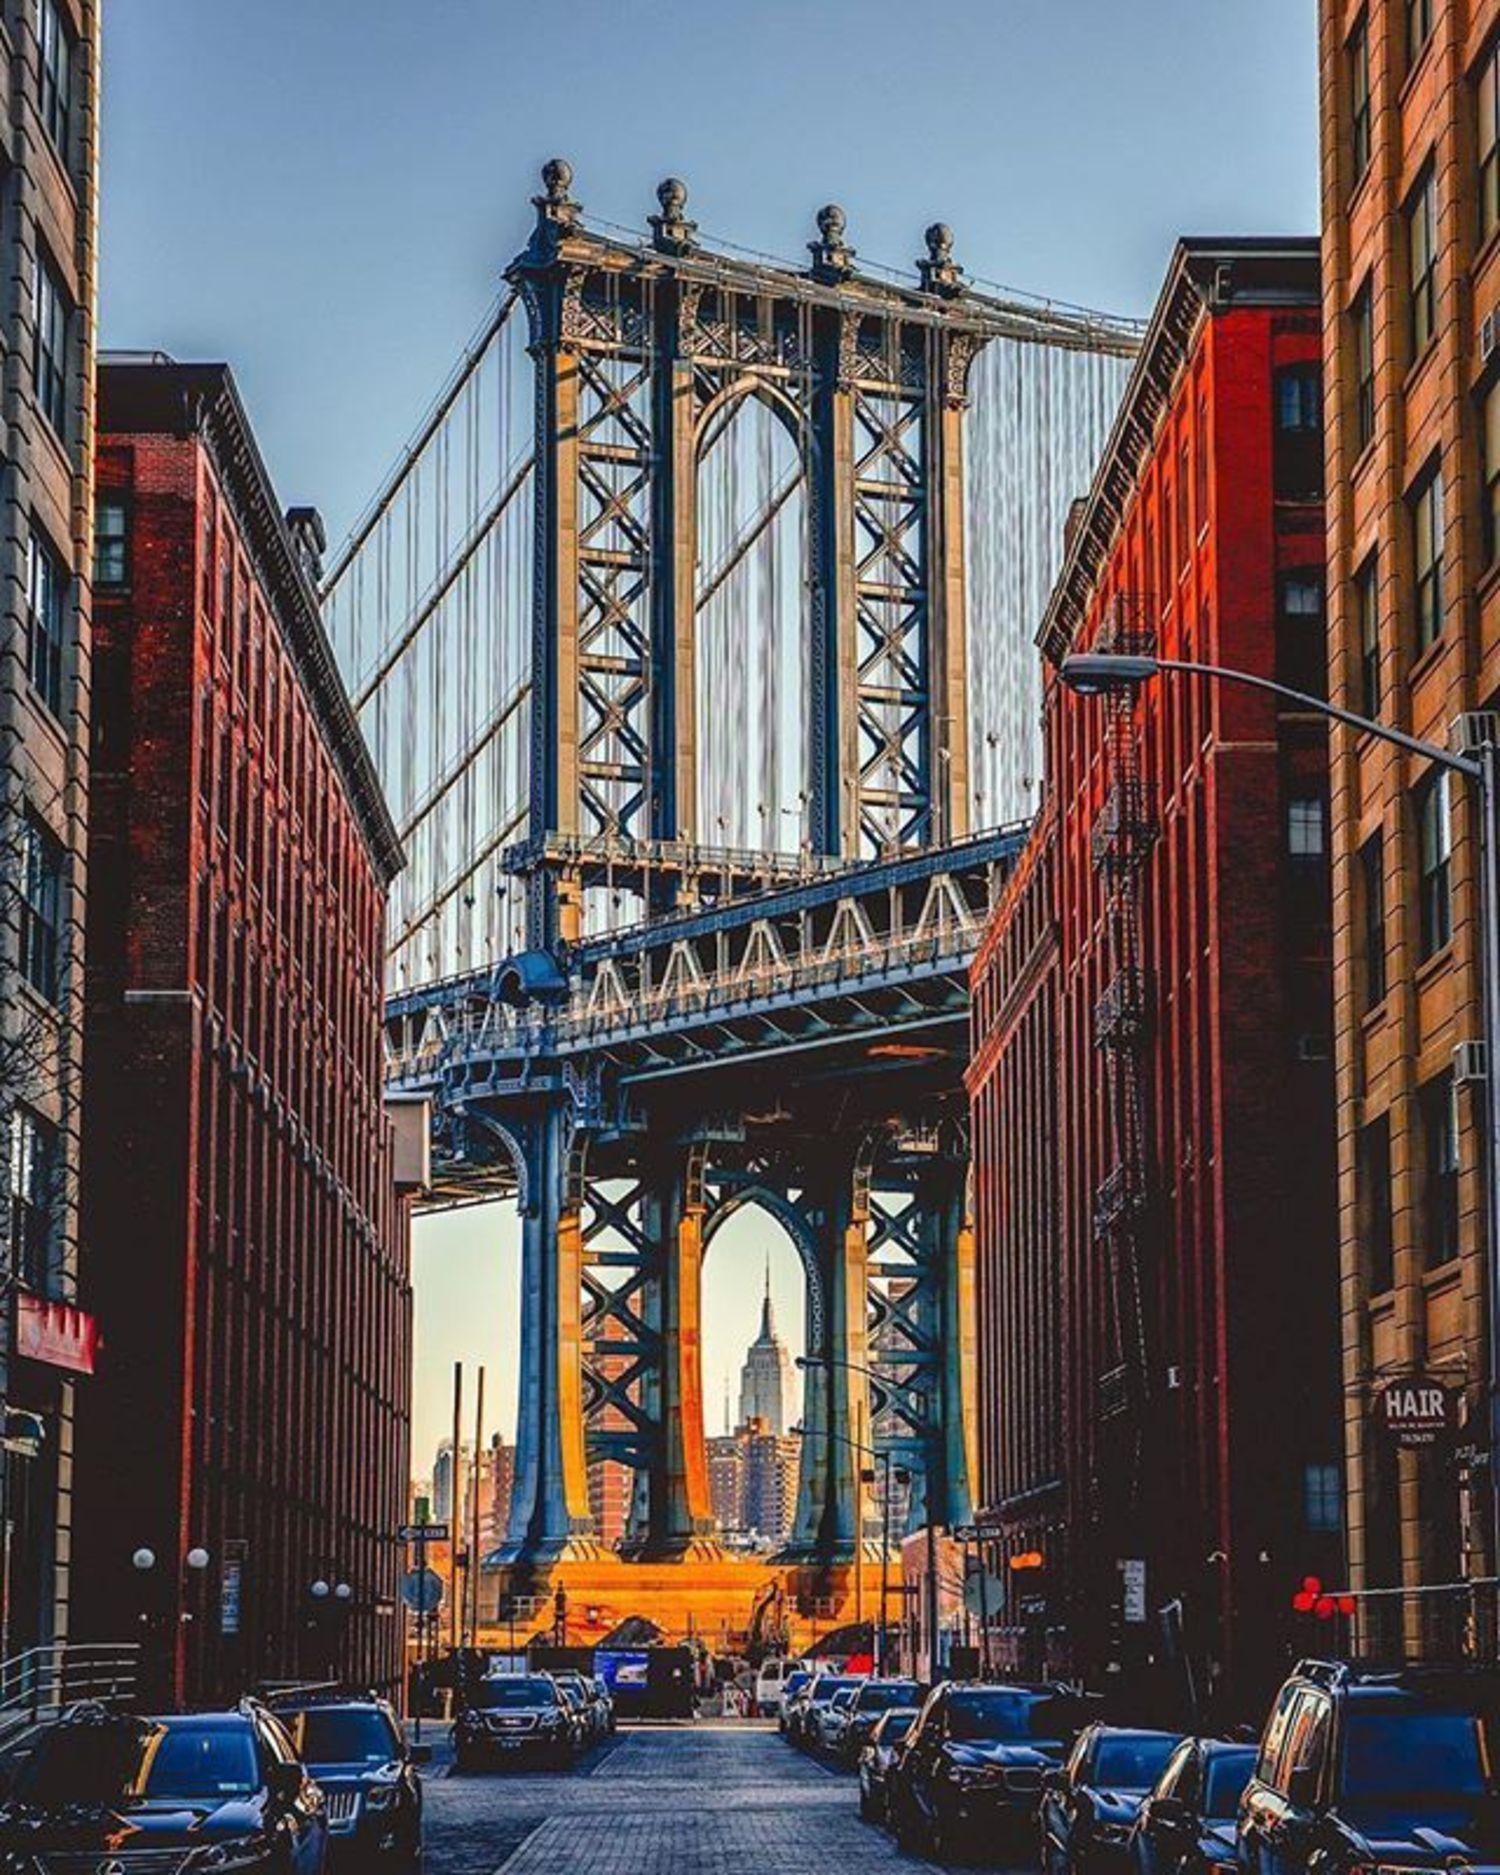 Dumbo, Brooklyn. Photo via @mc_gutty #viewingnyc #newyork #newyorkcity #nyc #manhattanbridge #empirestatebuilding